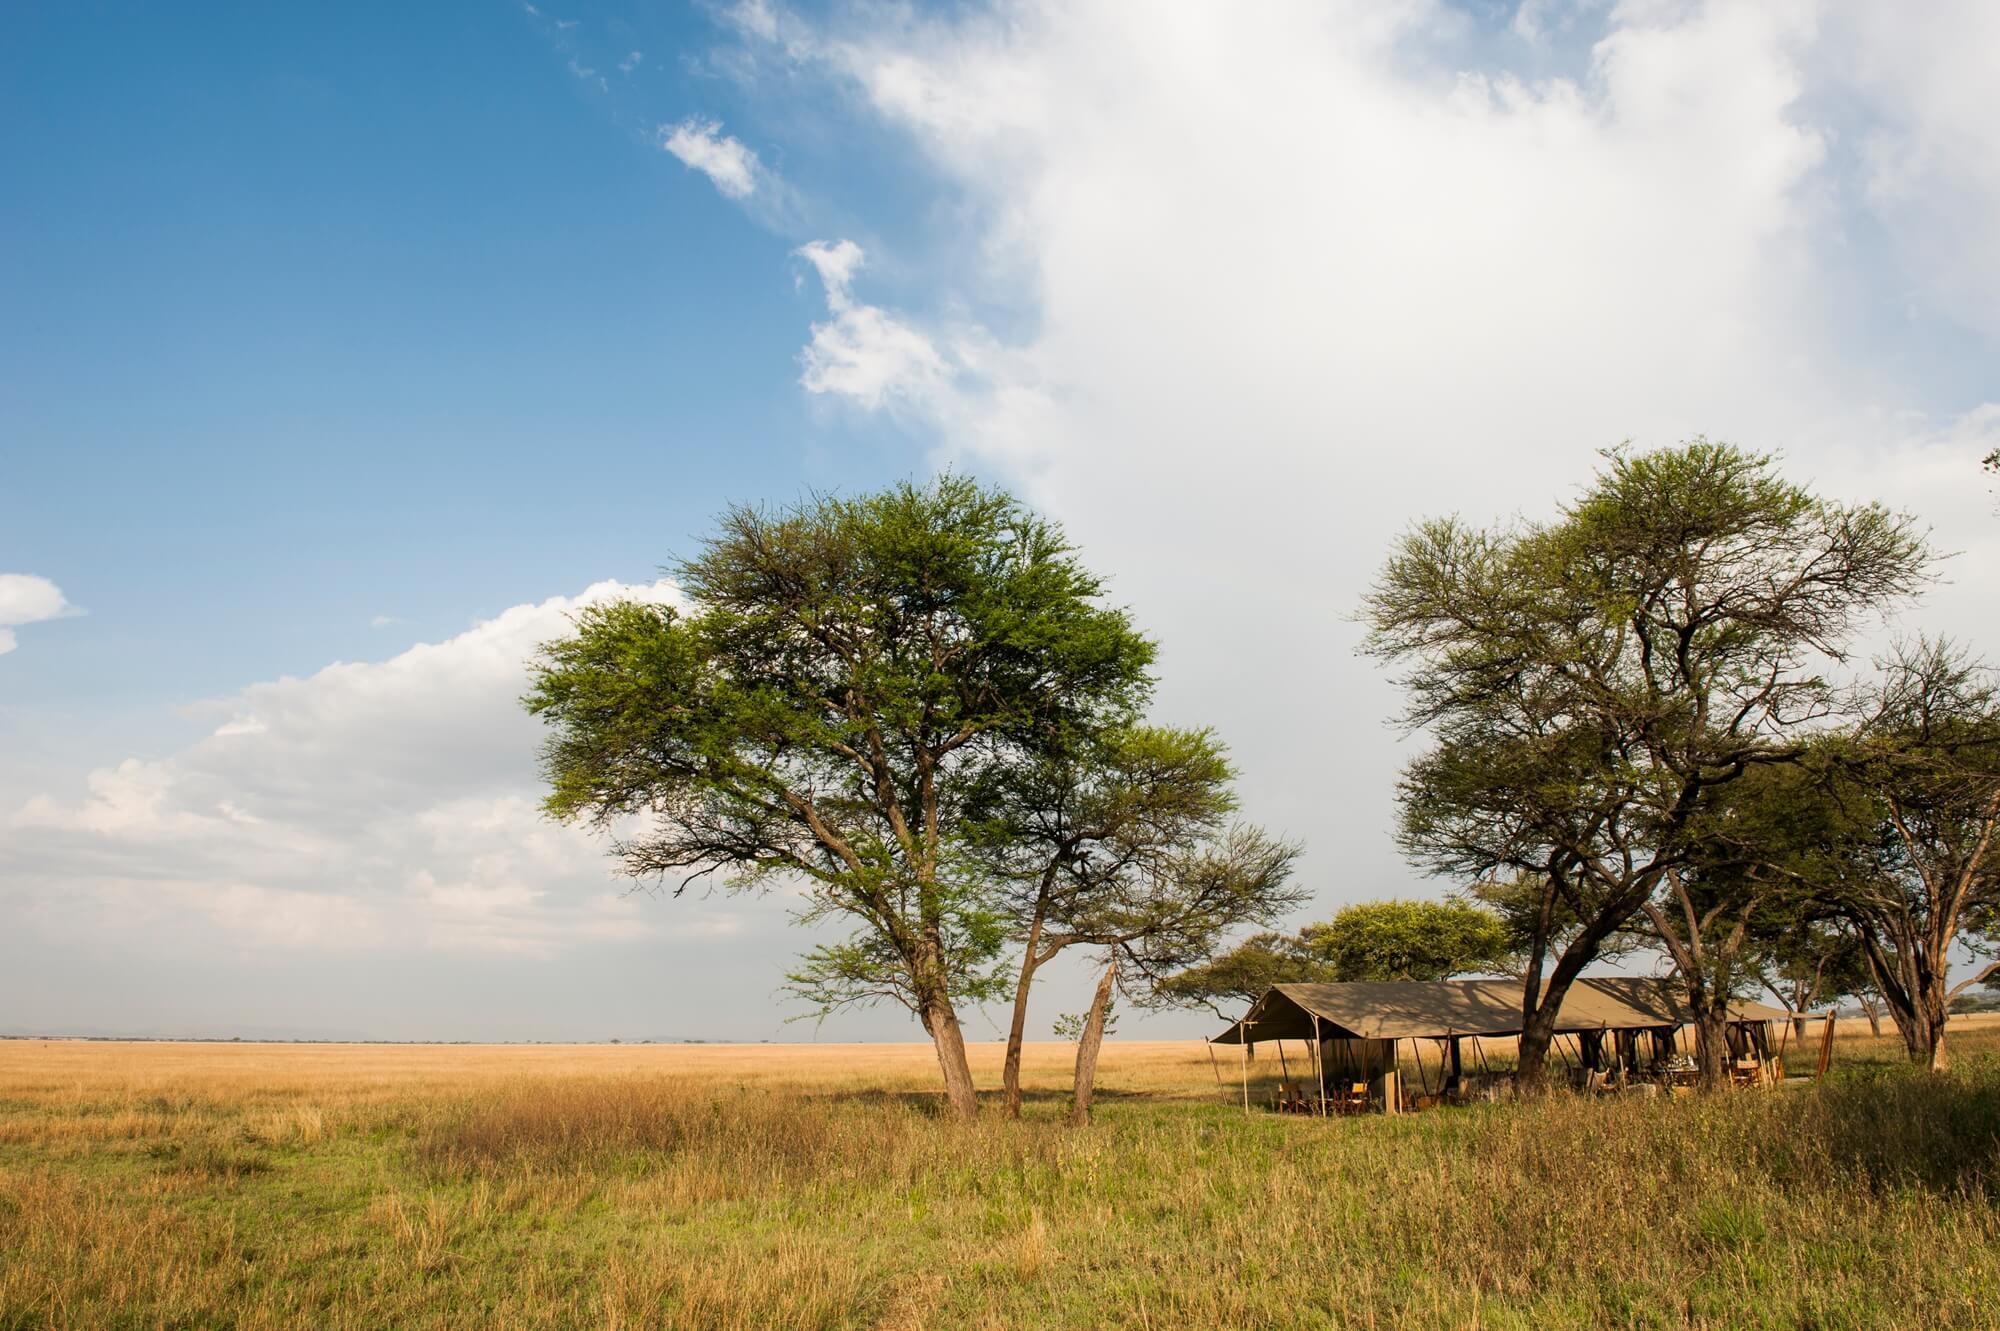 Nomad's Serengeti Safari Camp Ndutu